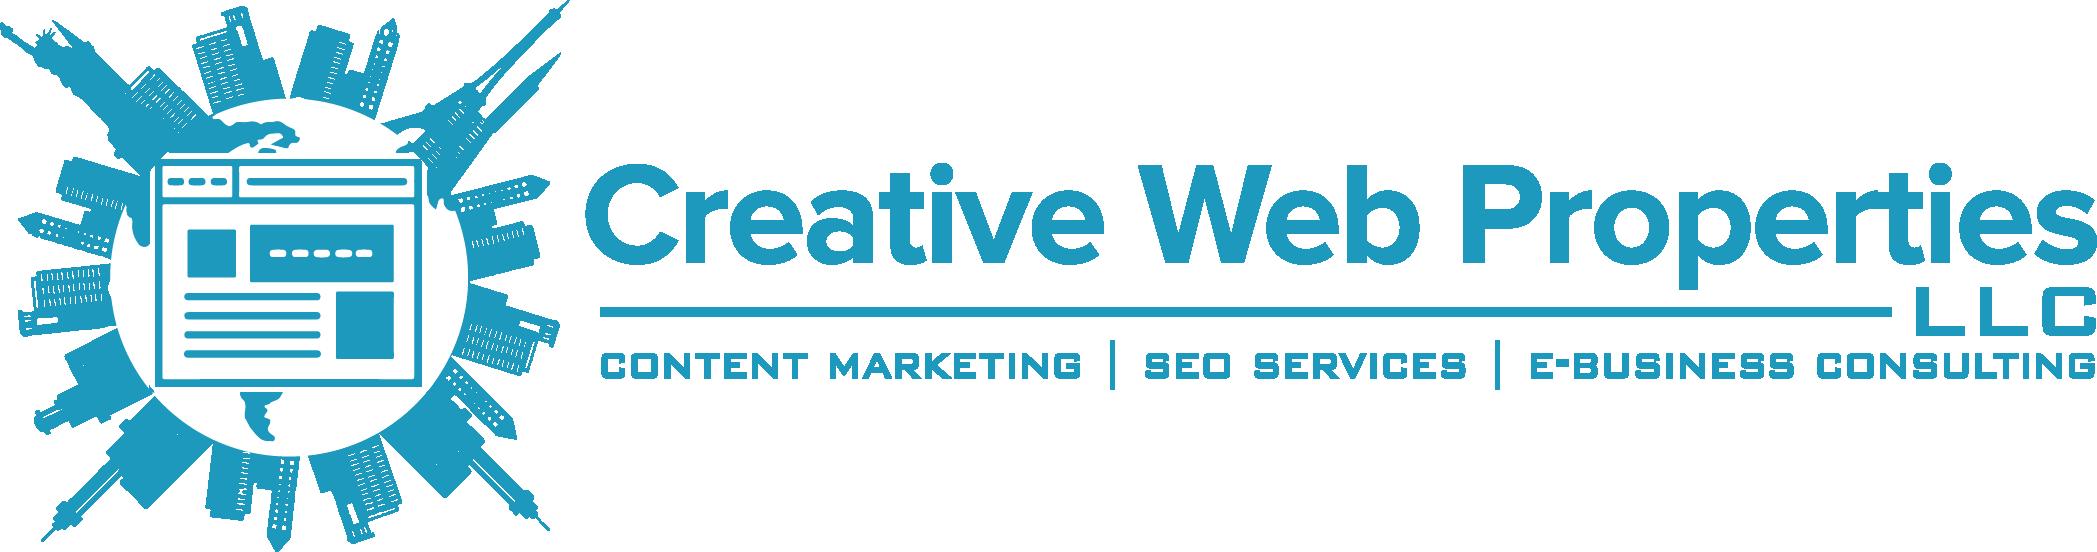 Creative Web Properties